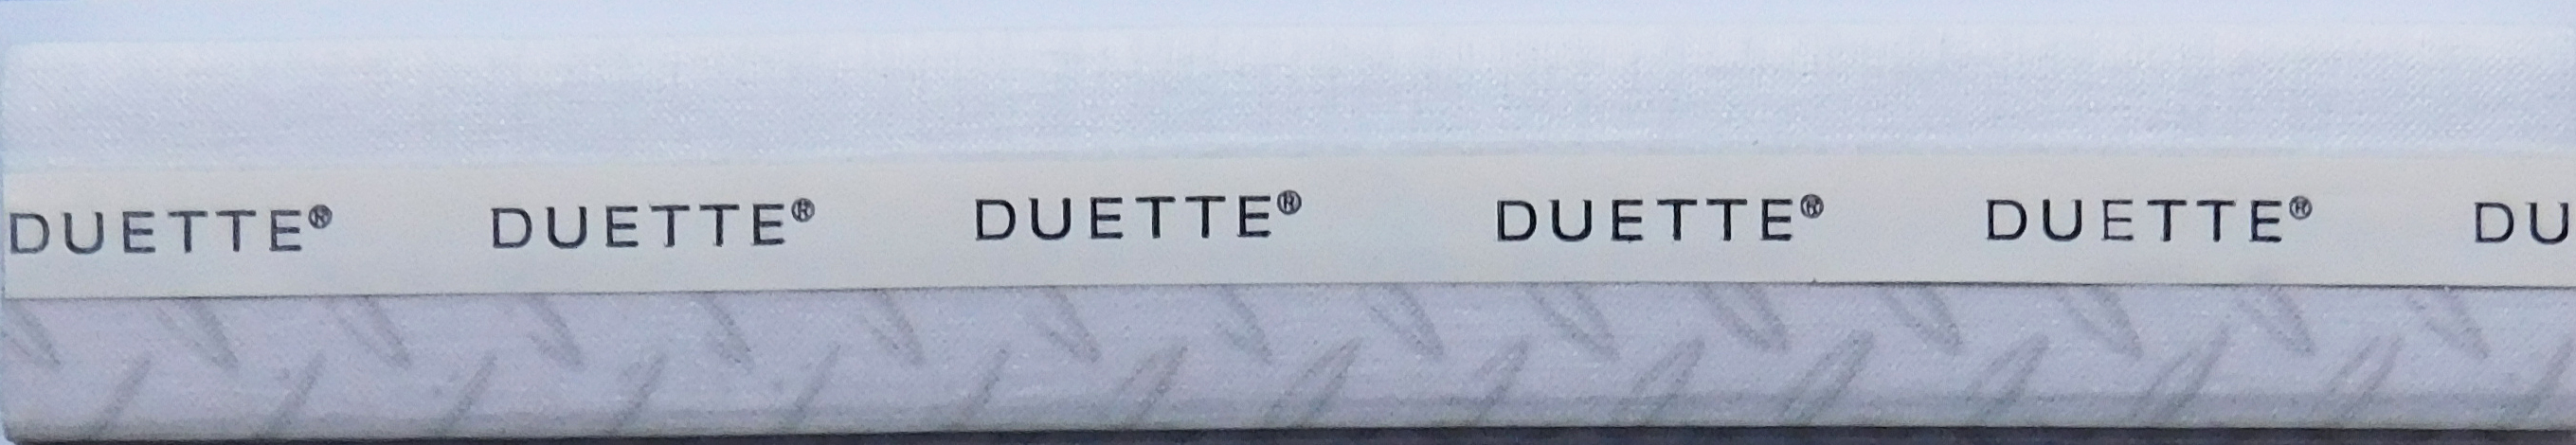 Hank Dolphin Duette Blind Fabric sample